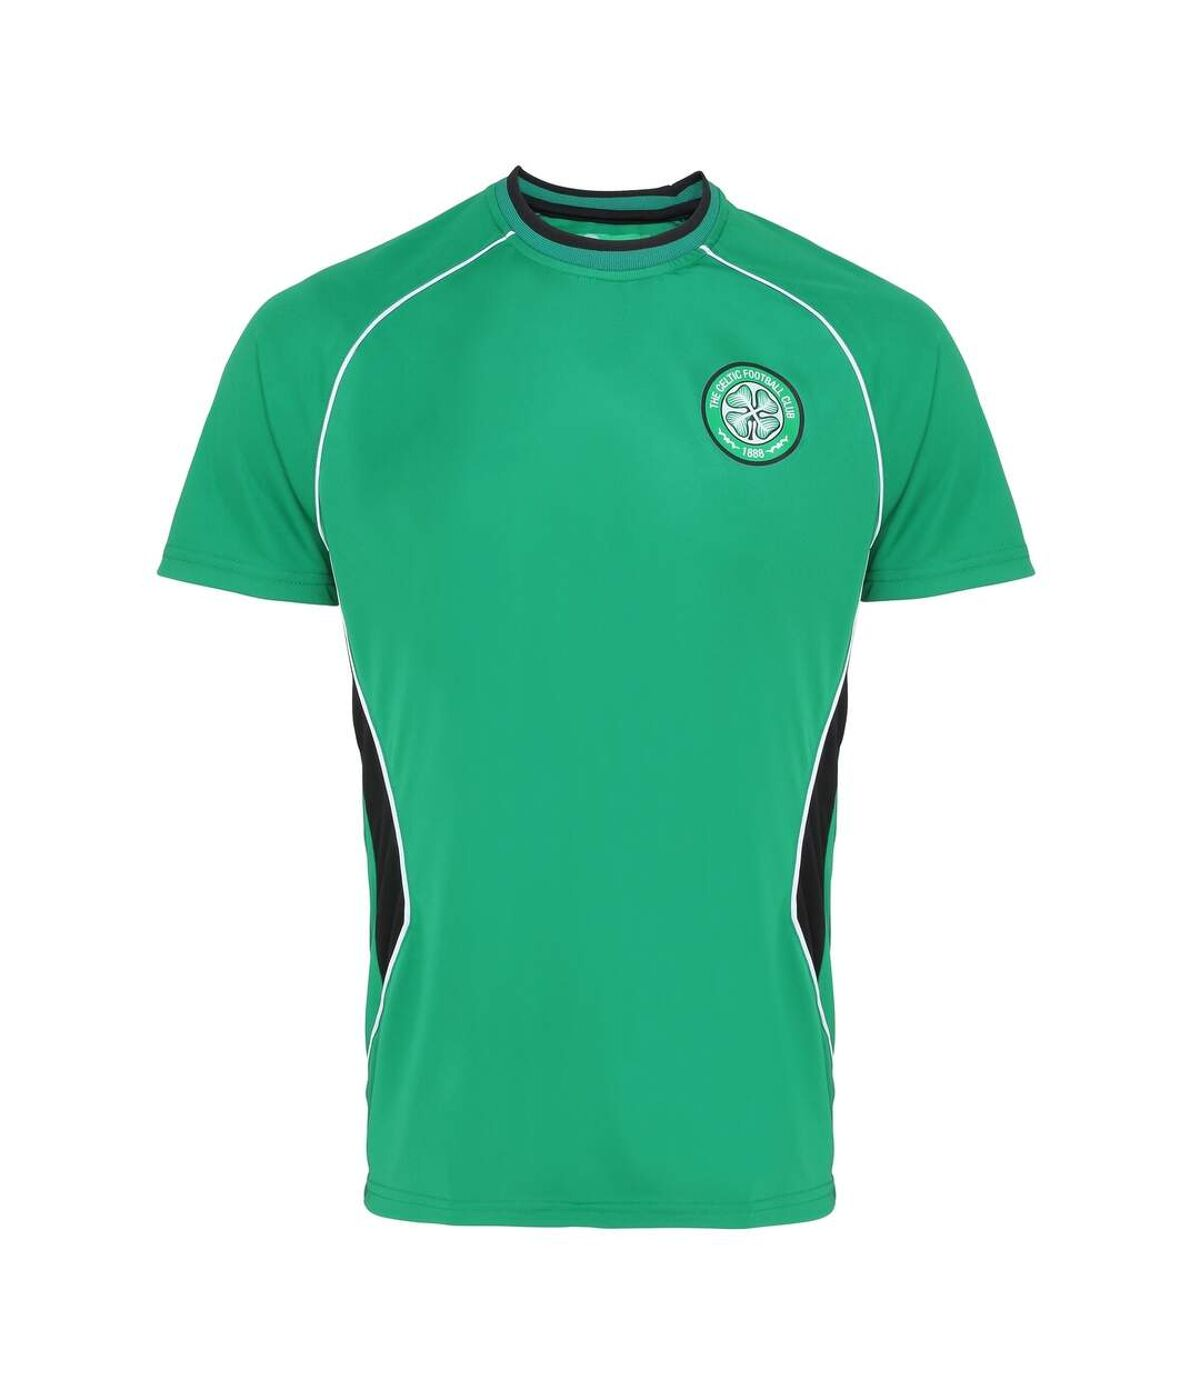 Celtic Fc - T-Shirt De Football - Homme (Vert) - UTRW4318